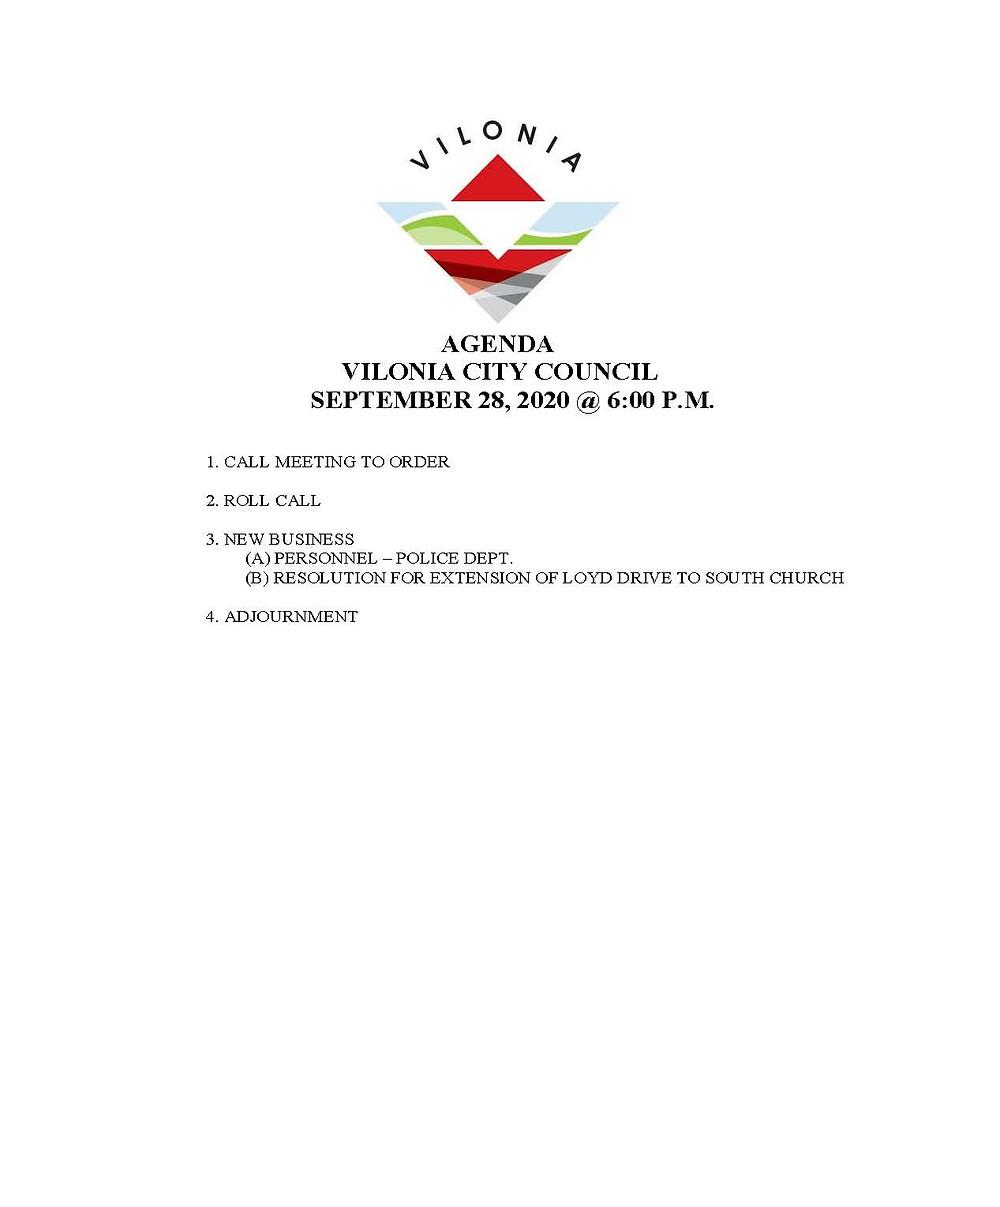 Vilonia City Council Agenda, Special Meeting